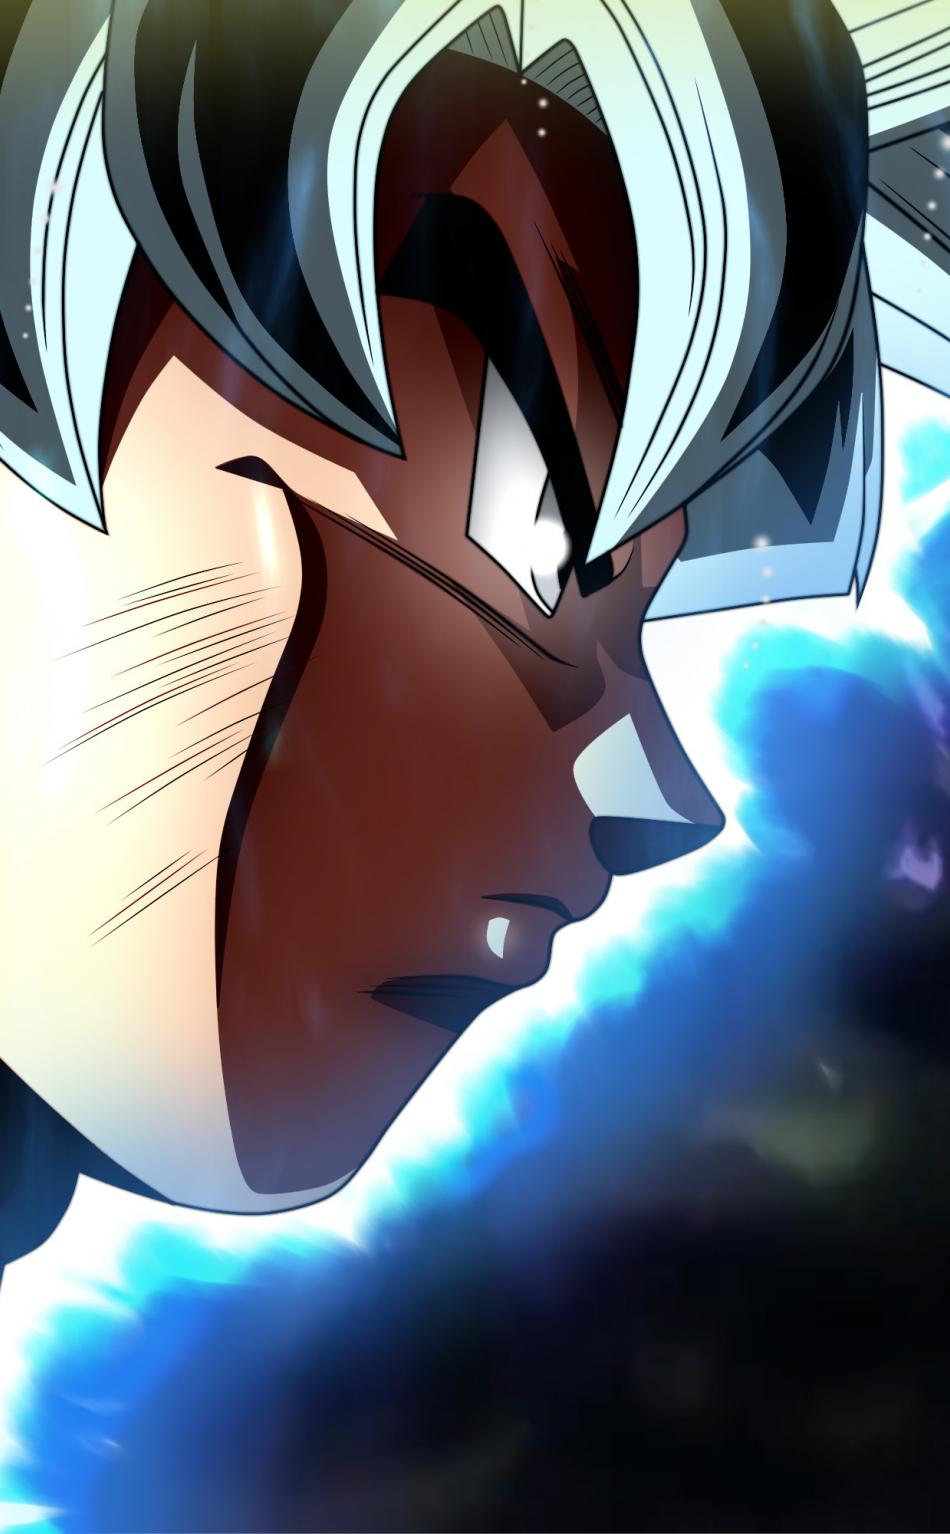 Download 950x1534 Wallpaper Goku S Face Dragon Ball Super